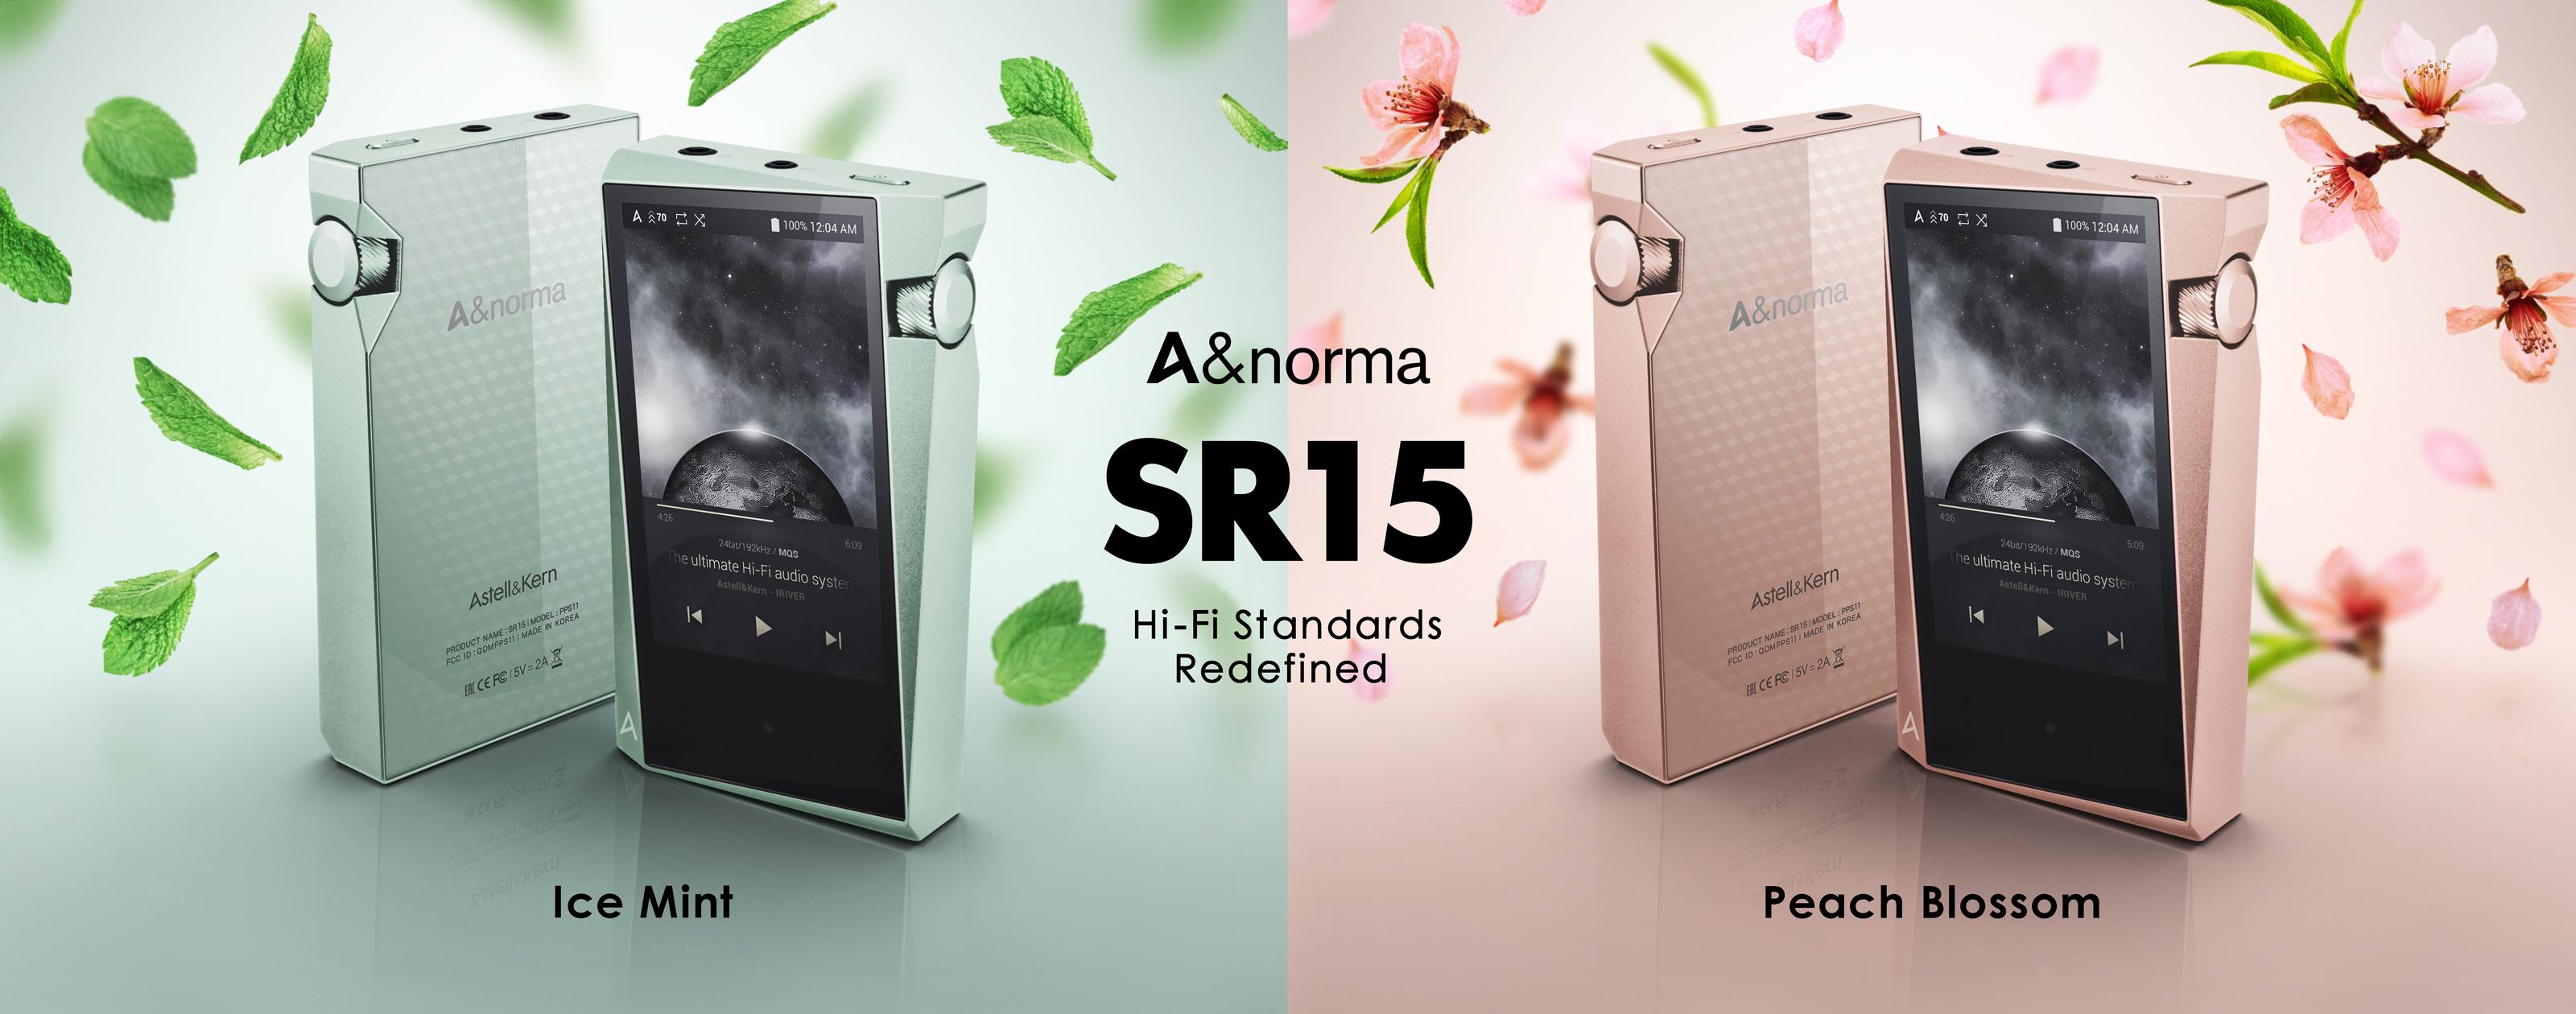 Astell&Kern A&norma SR15 日本限定カラー